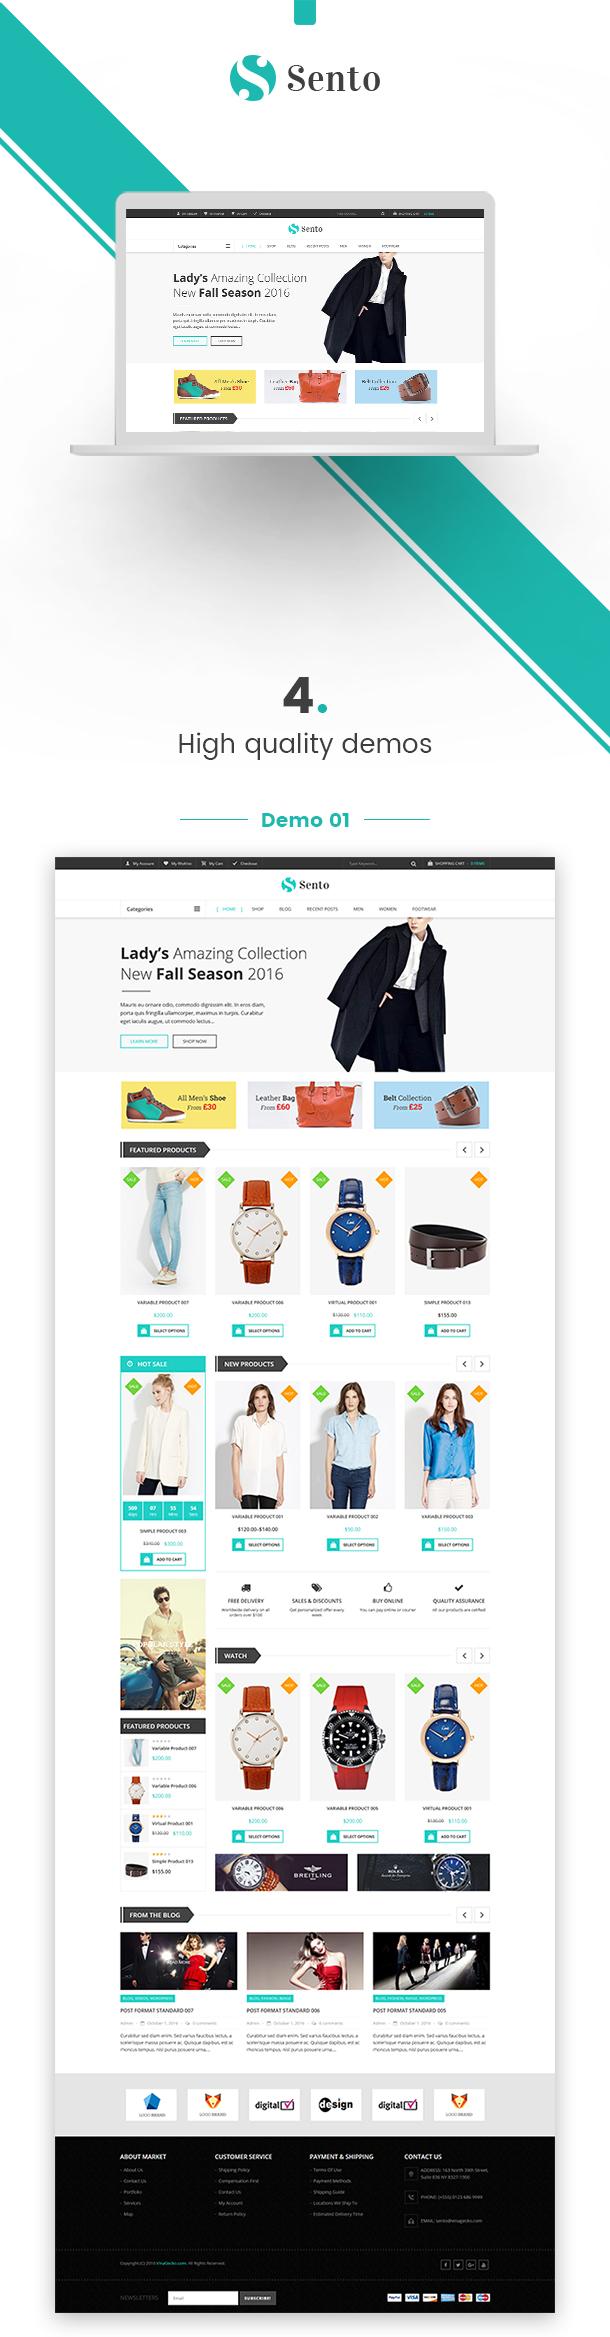 VG Sento - eCommerce WordPress Theme for Fashion Store - 14